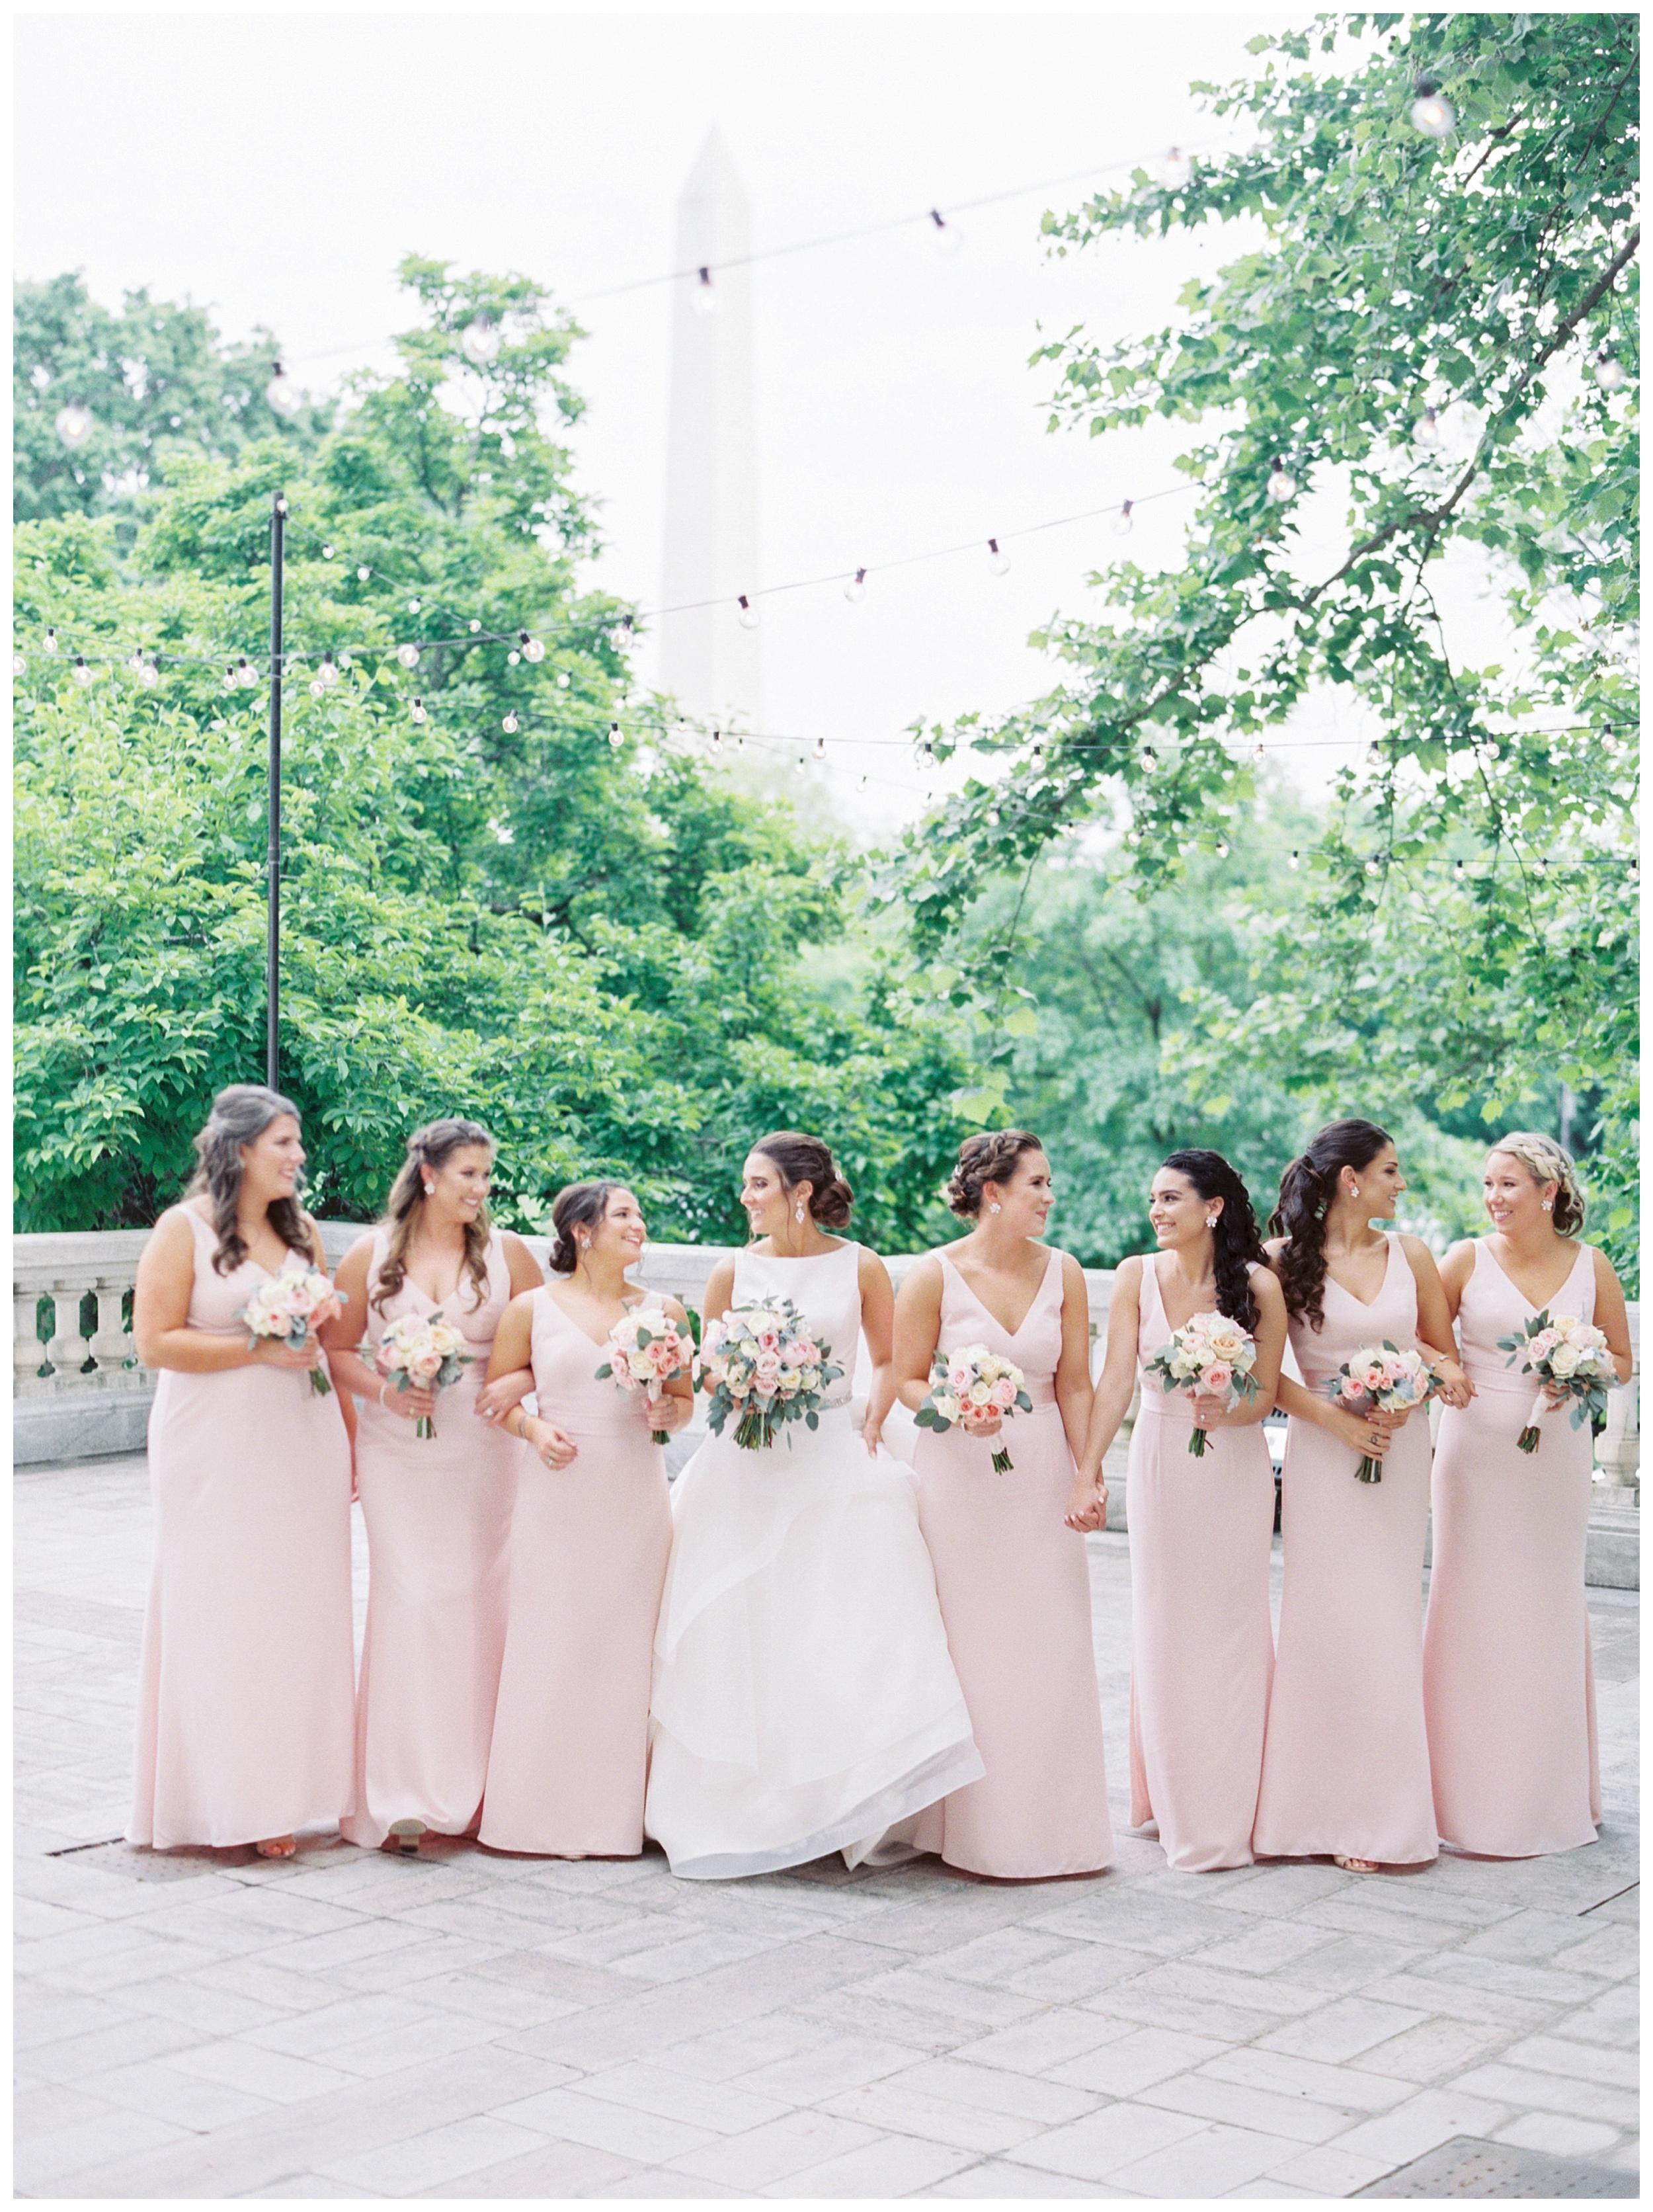 DAR Constitution Hall Wedding Wedding | Daughters of the American Revolution Wedding | District of Columbia Film Wedding Photographer Kir Tuben_0087.jpg